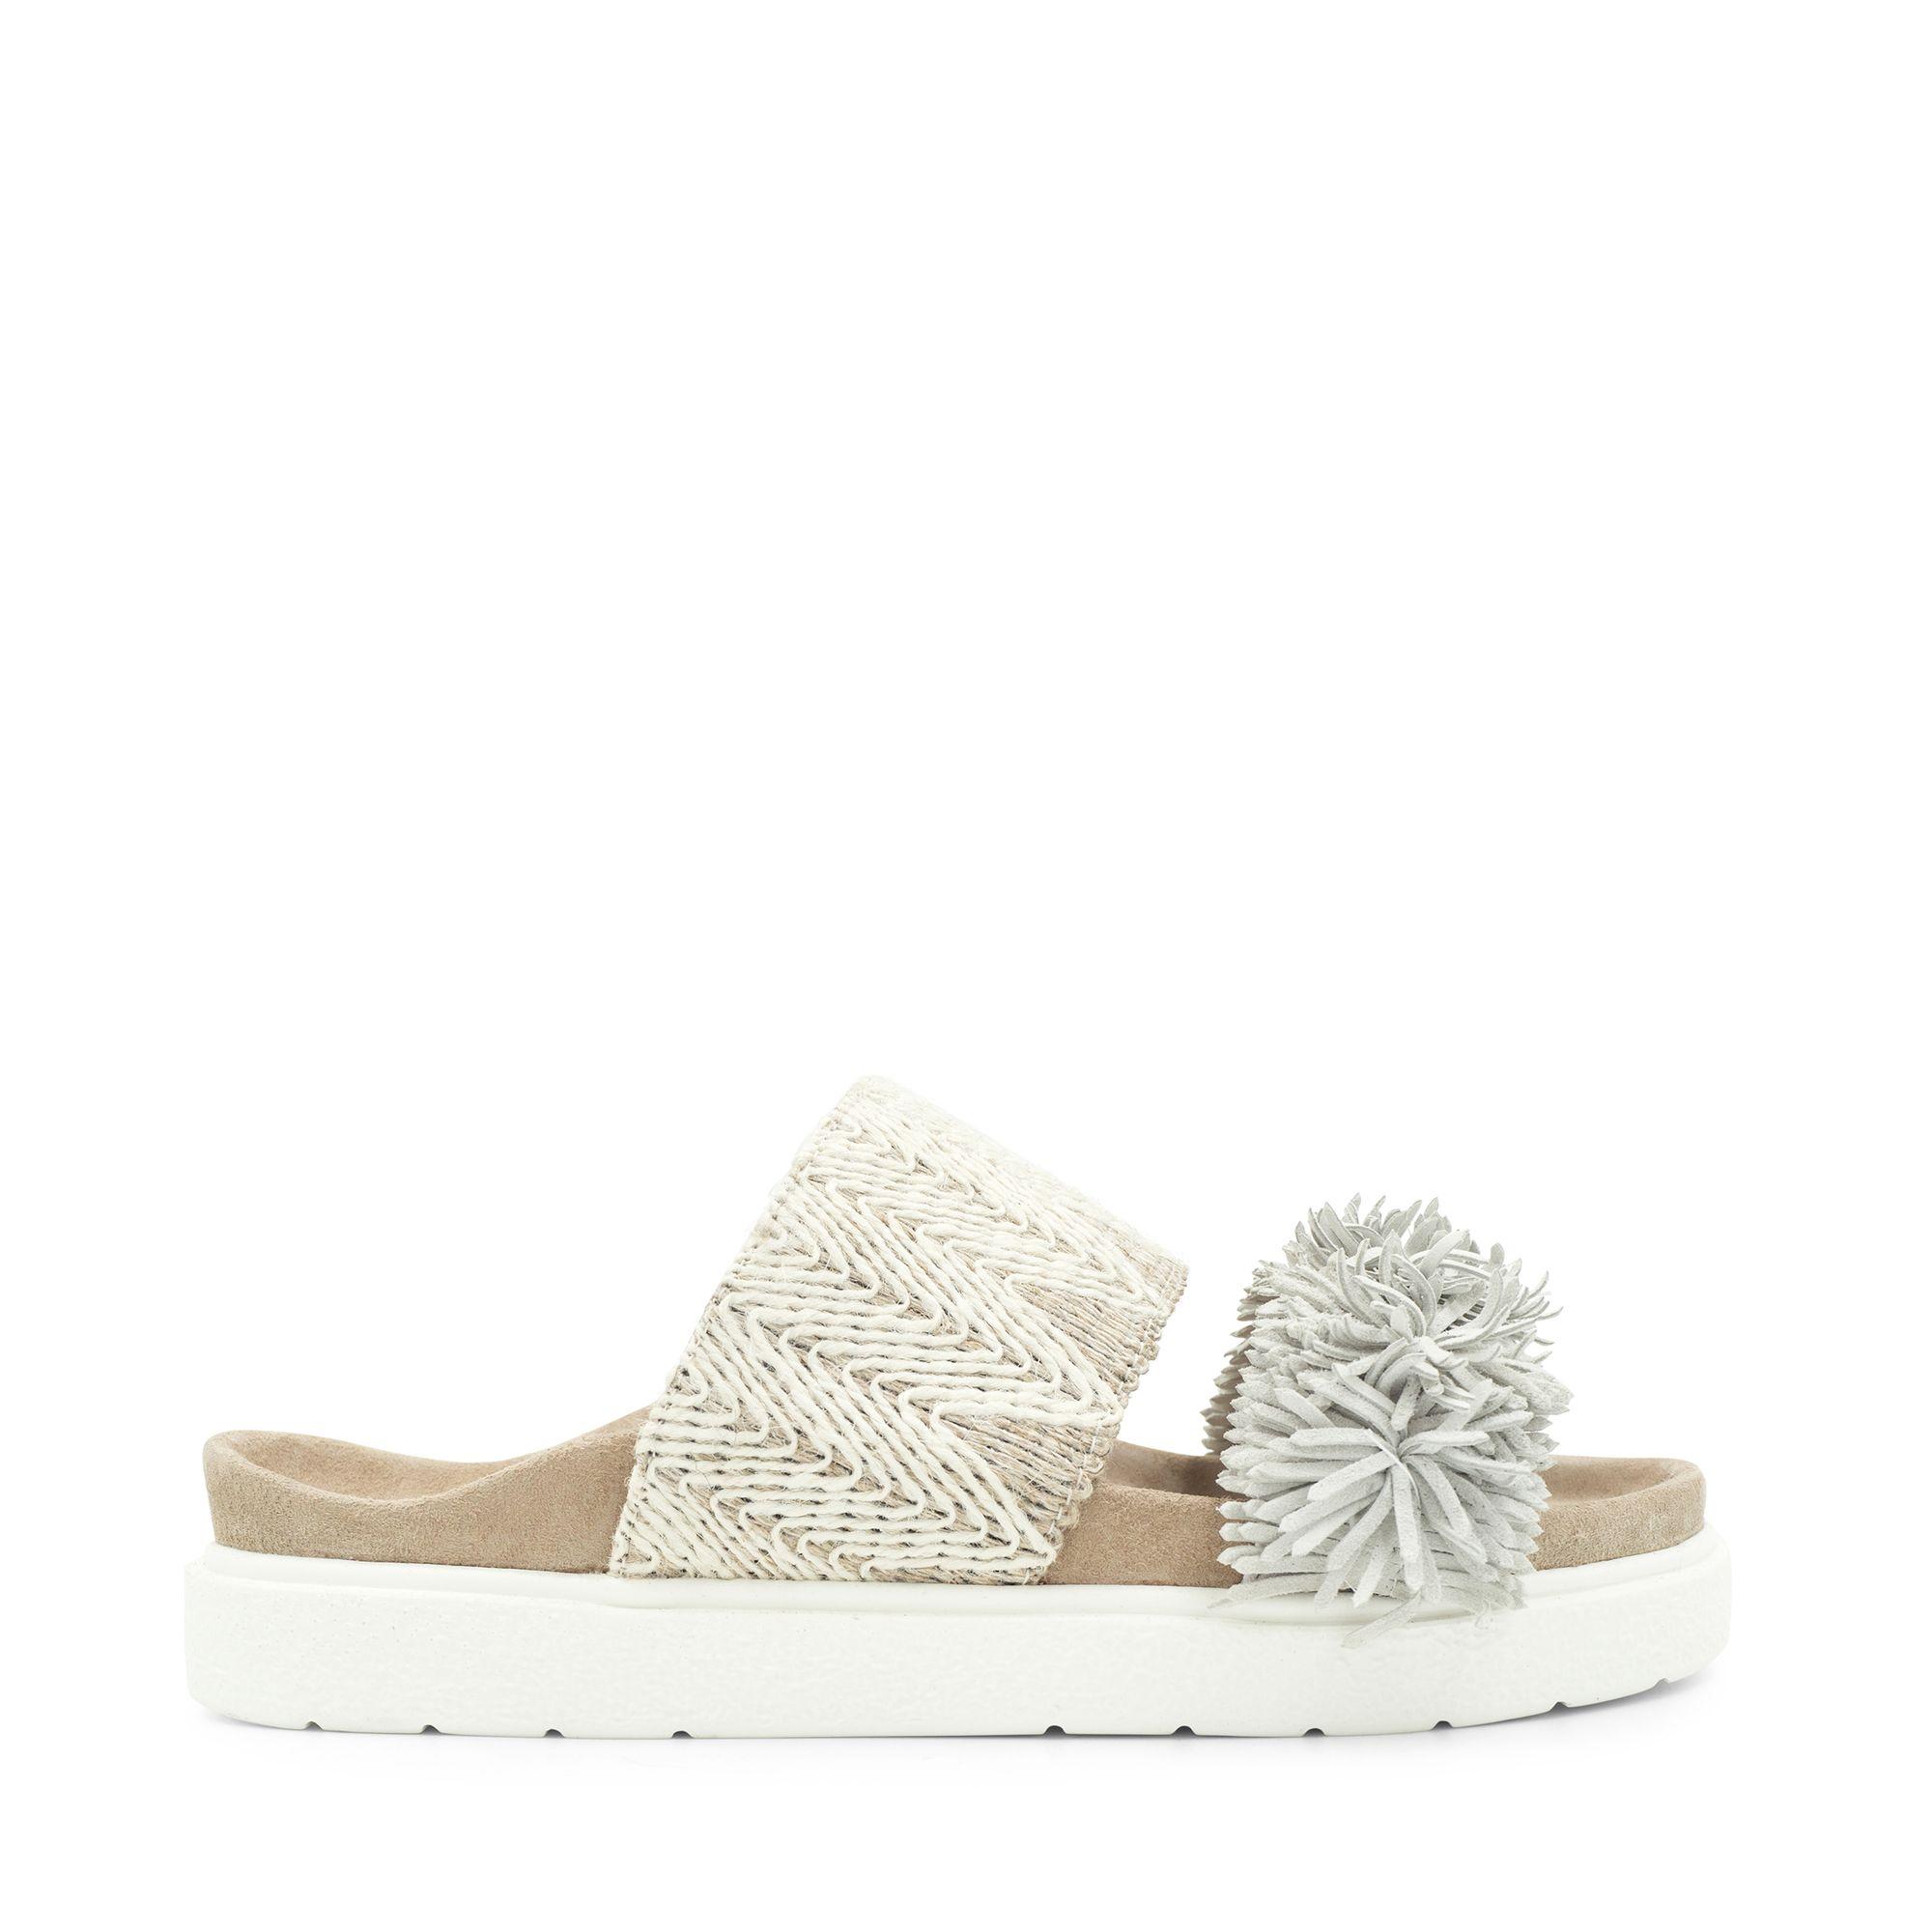 Handla online Inuikii Slipper Raffia Striped sandaler i